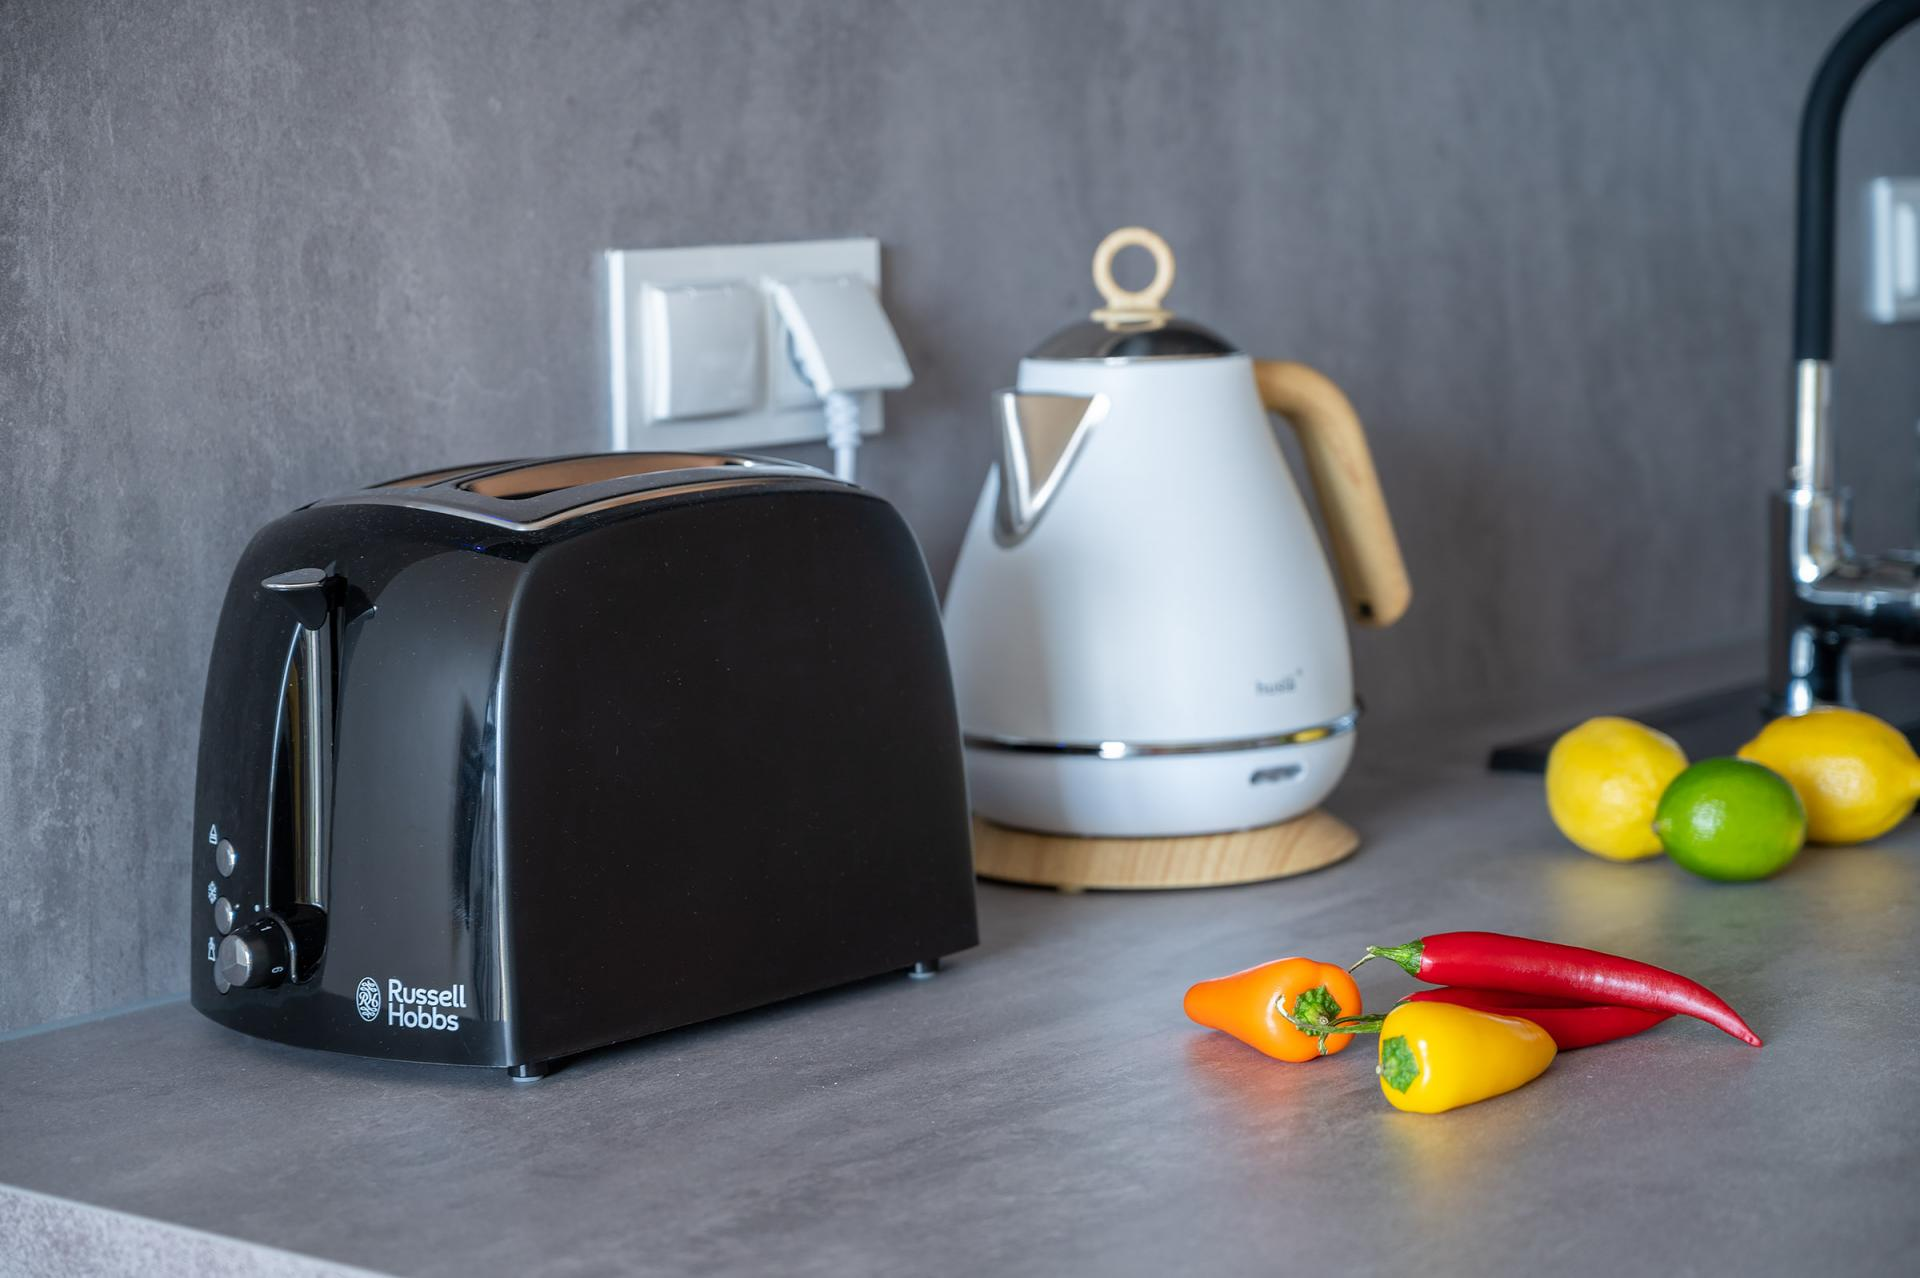 Toaster at Cybernetyki Apartments, Sluzewiec, Warsaw